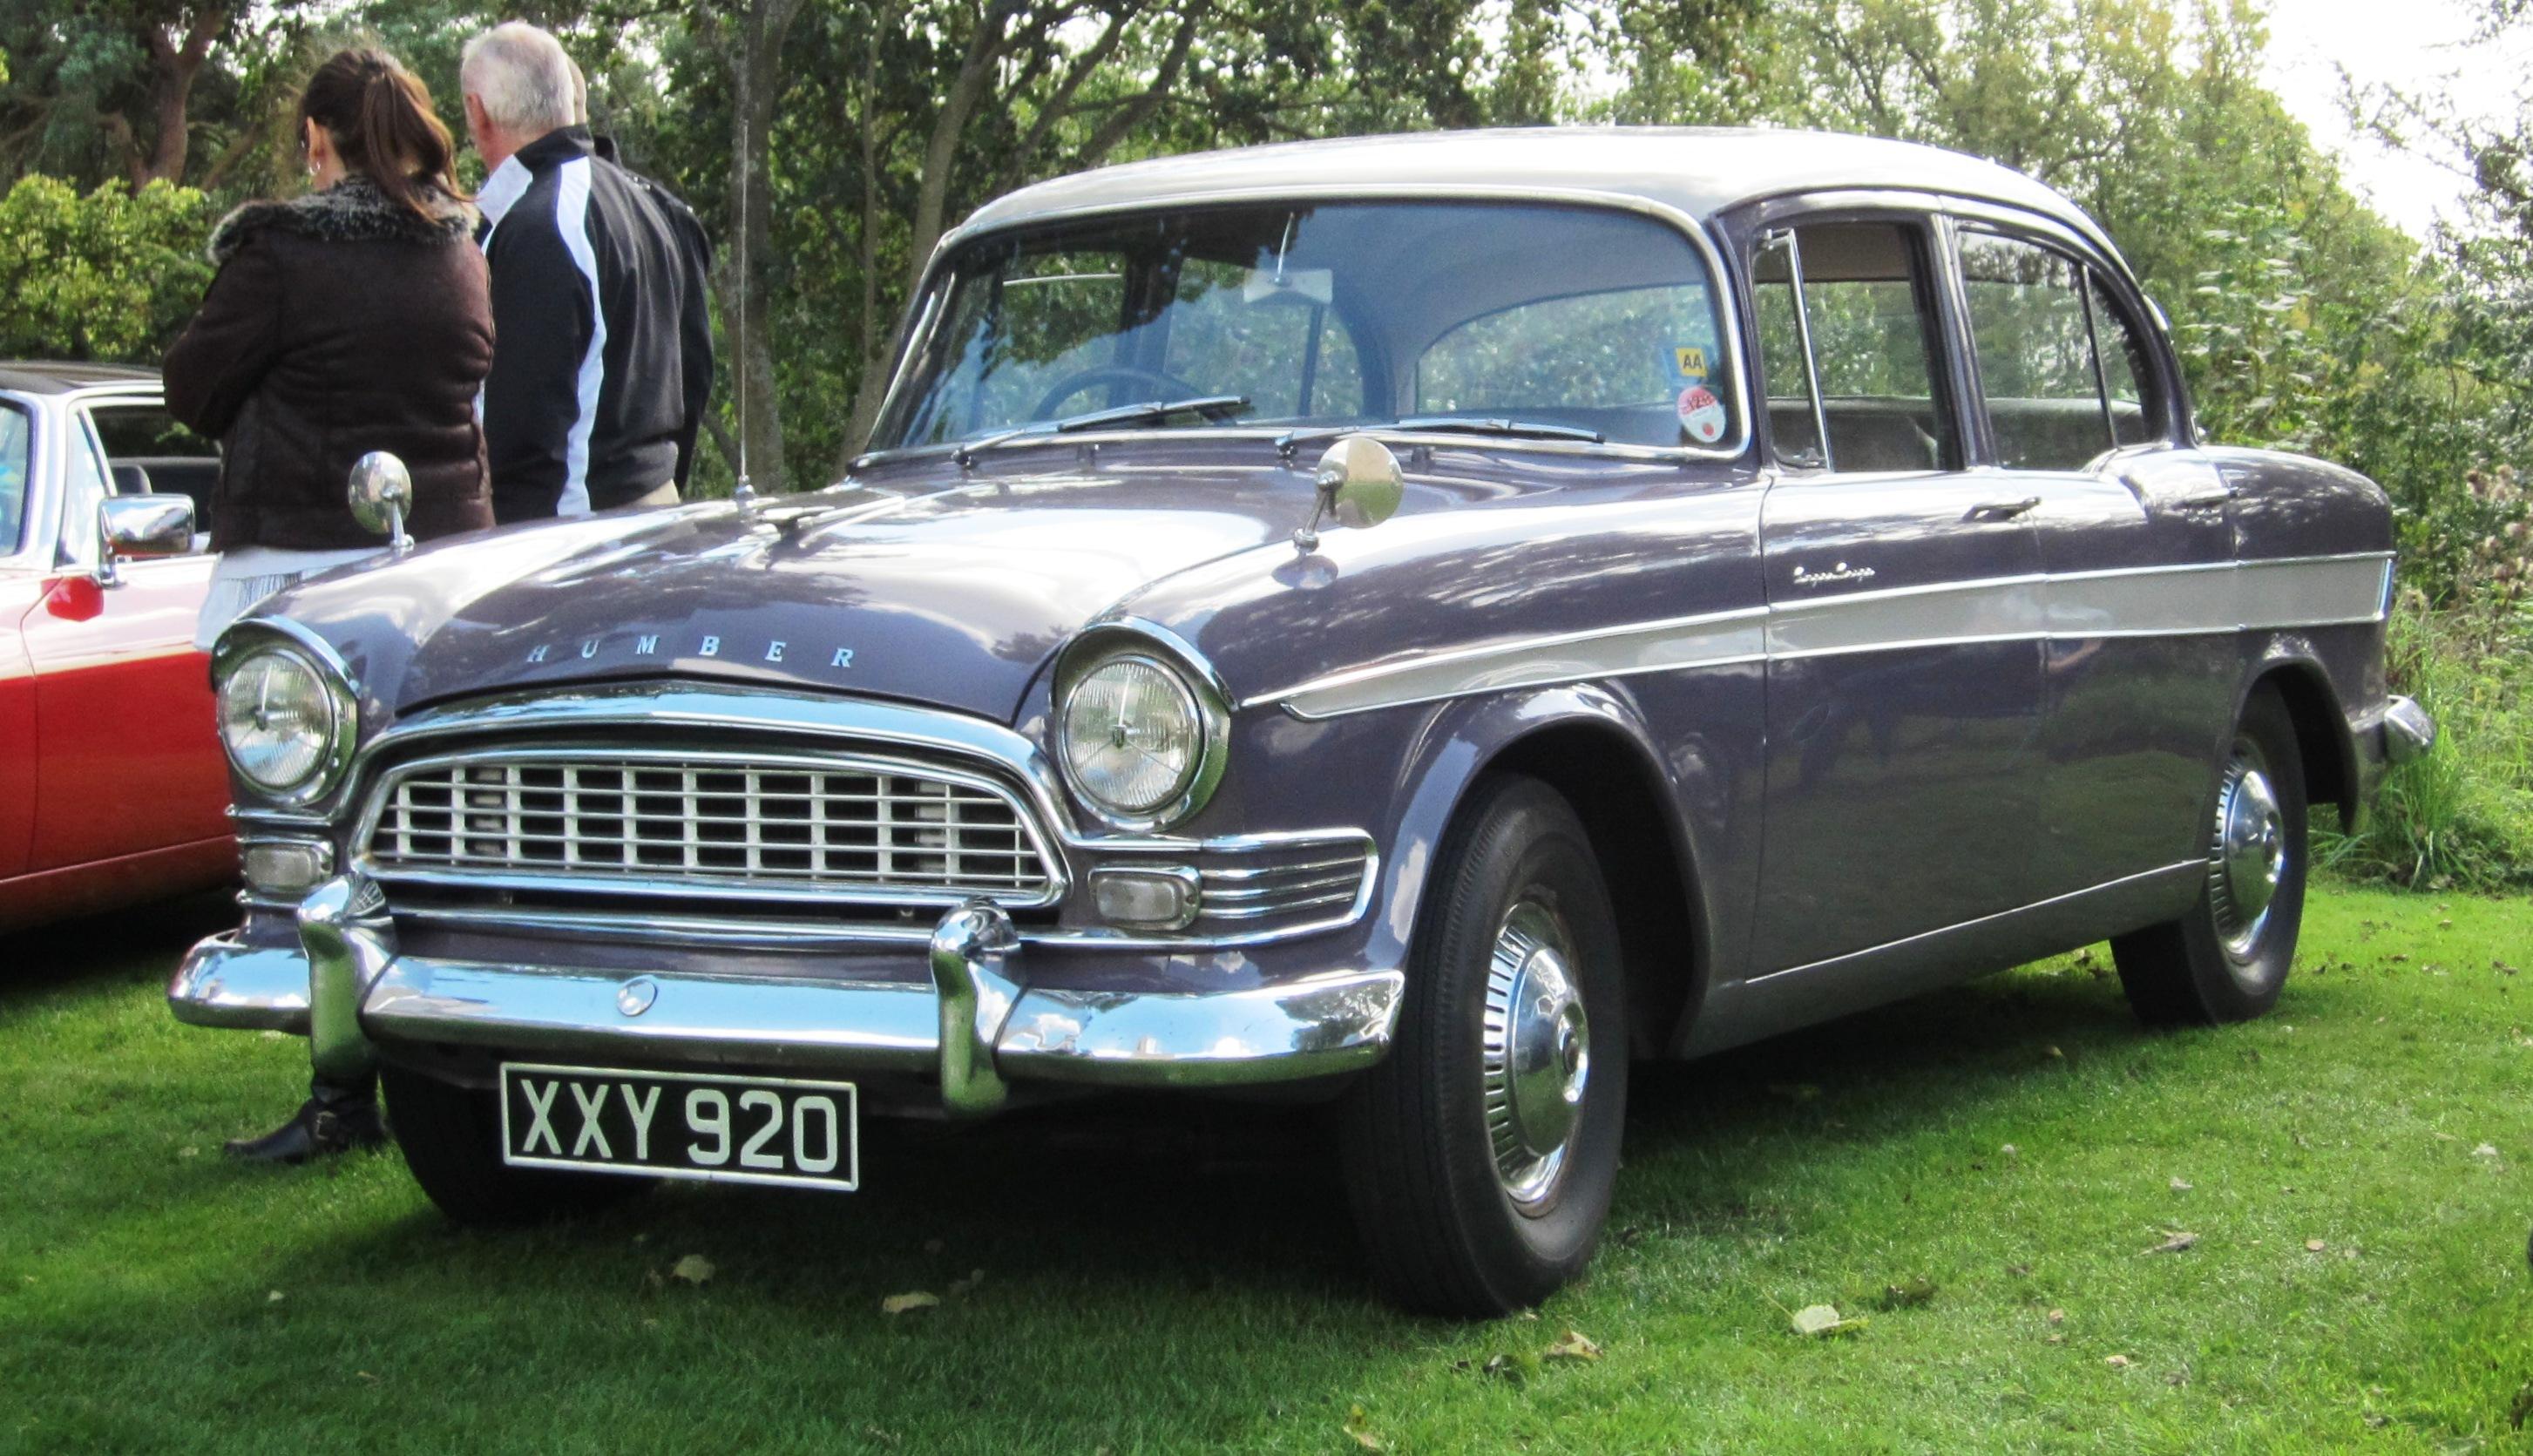 Limousine For Sale >> File:Humber Super Snipe Series II 2965cc November 1959.jpg ...